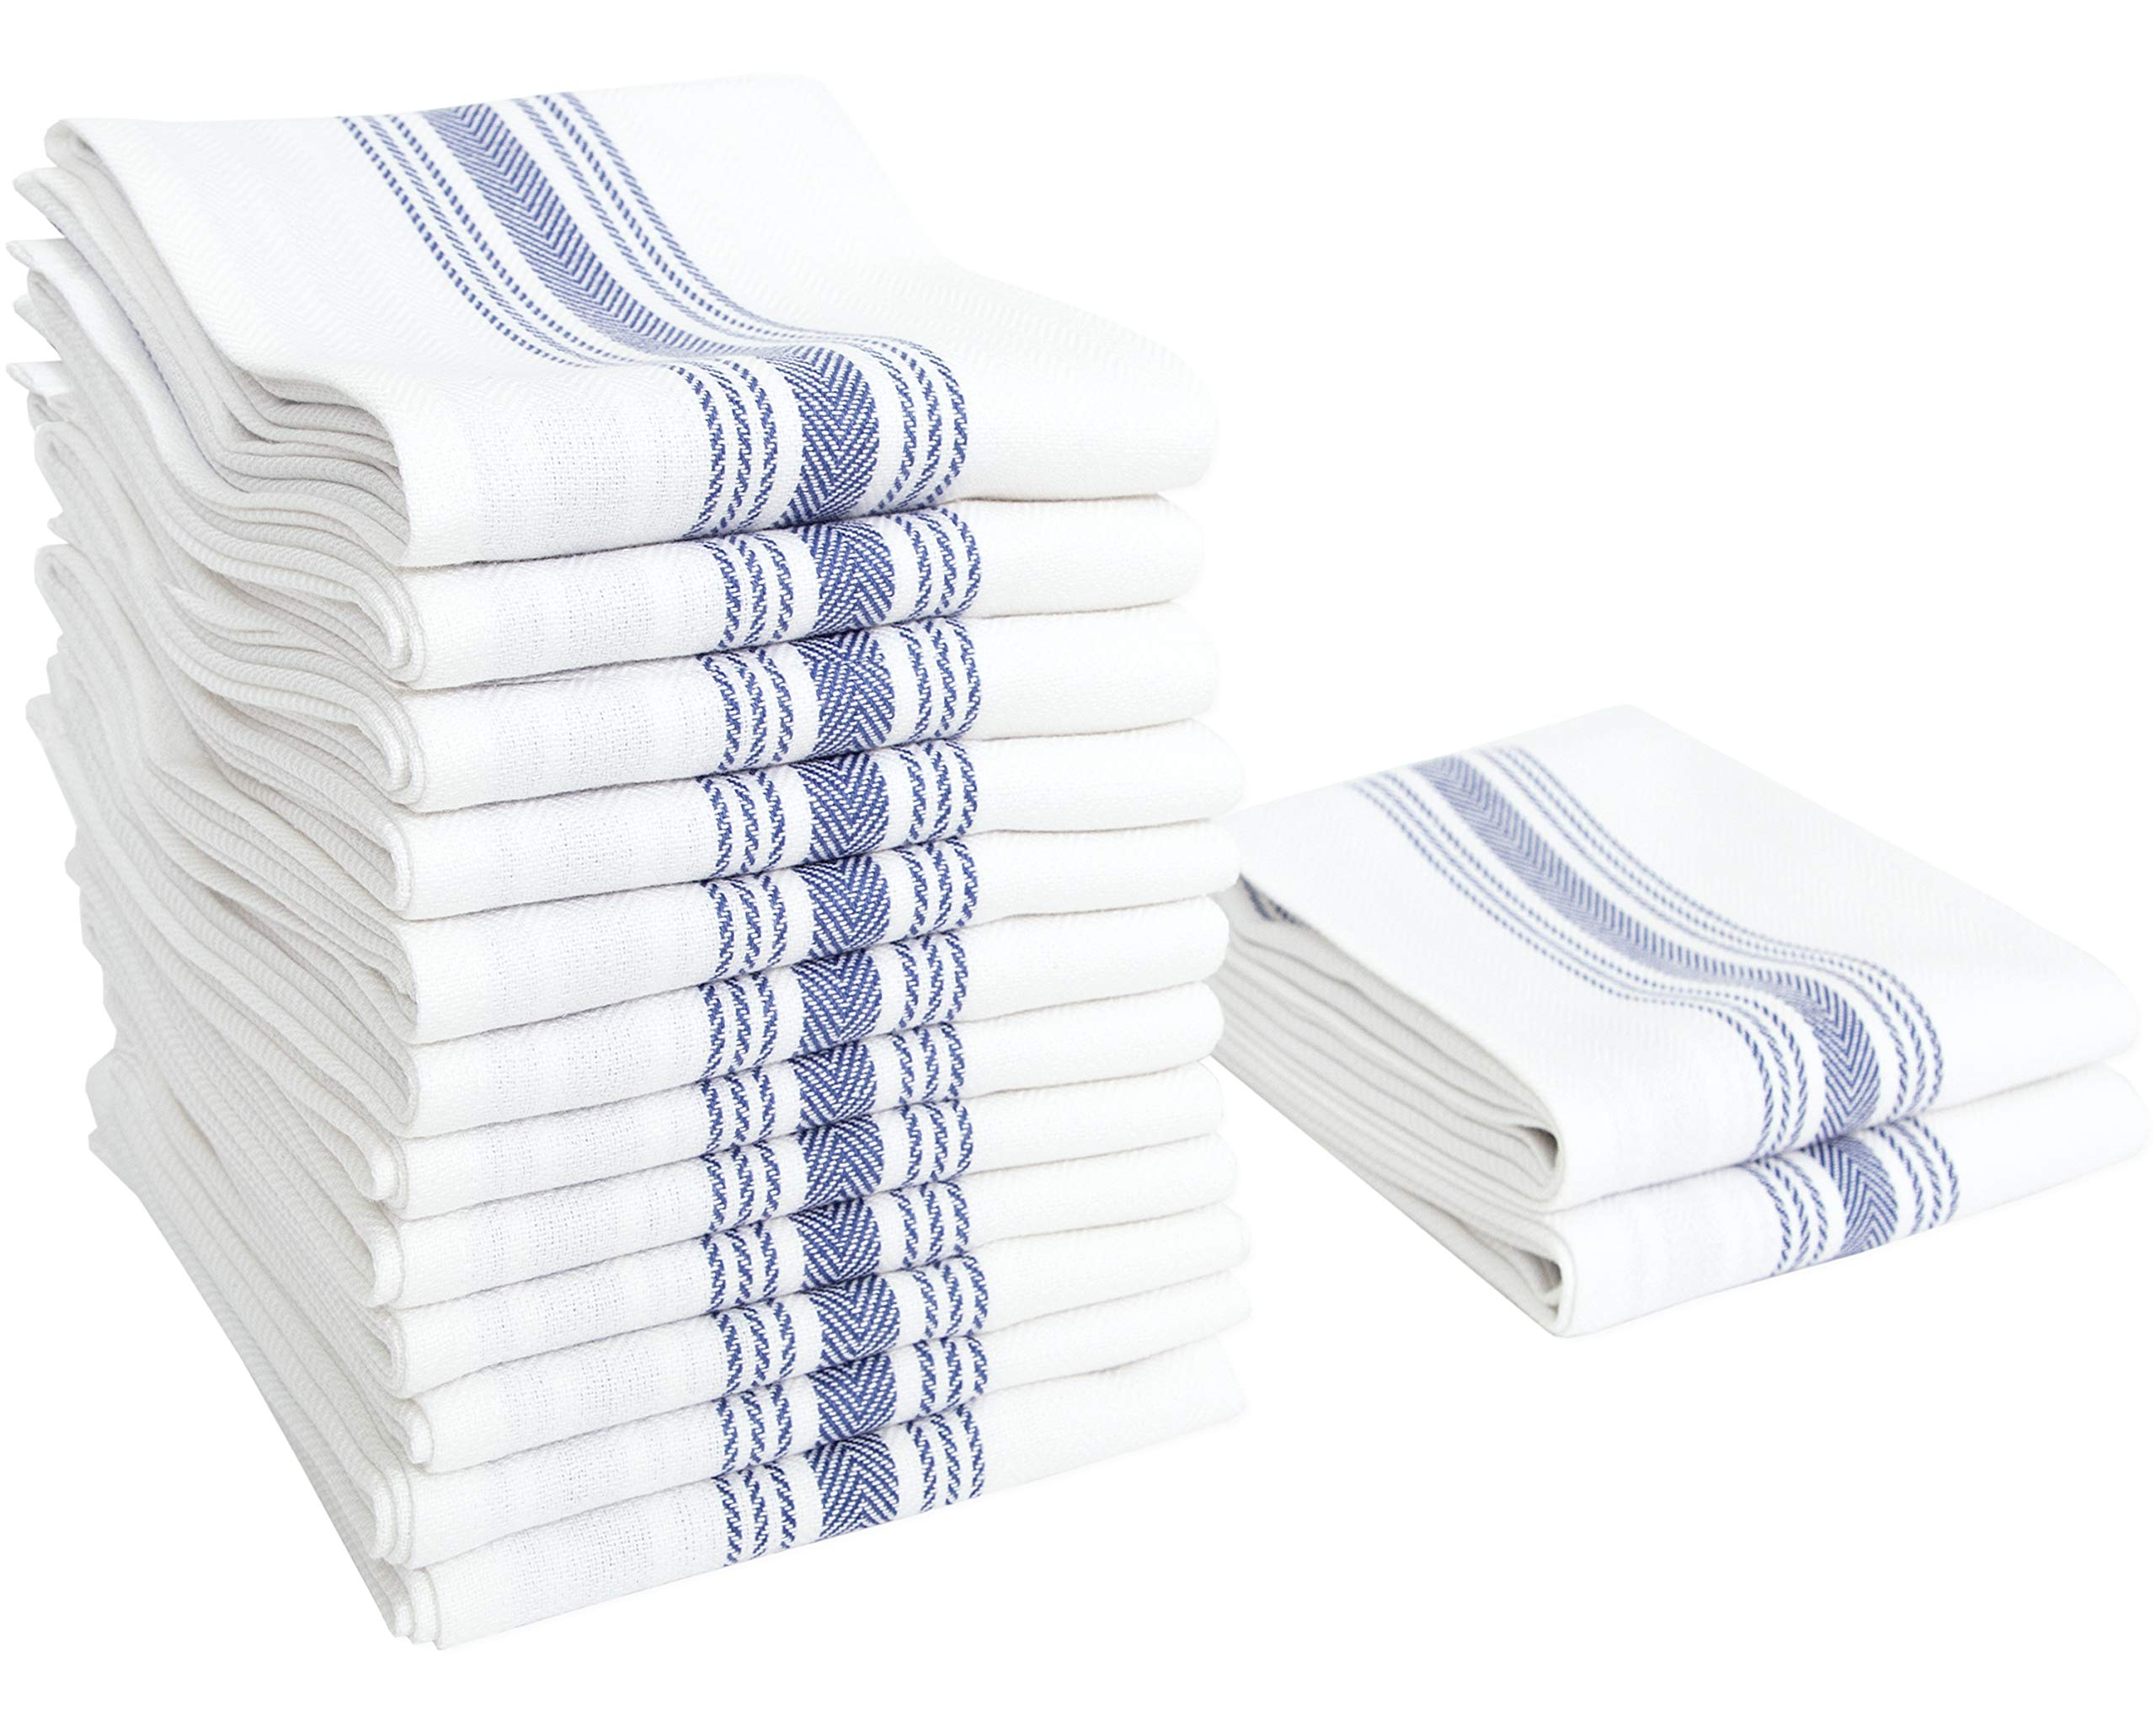 Value Basics Herringbone Stripe Kitchen Towel Set, 15'' x 25'', 14-Pack, Blue & White